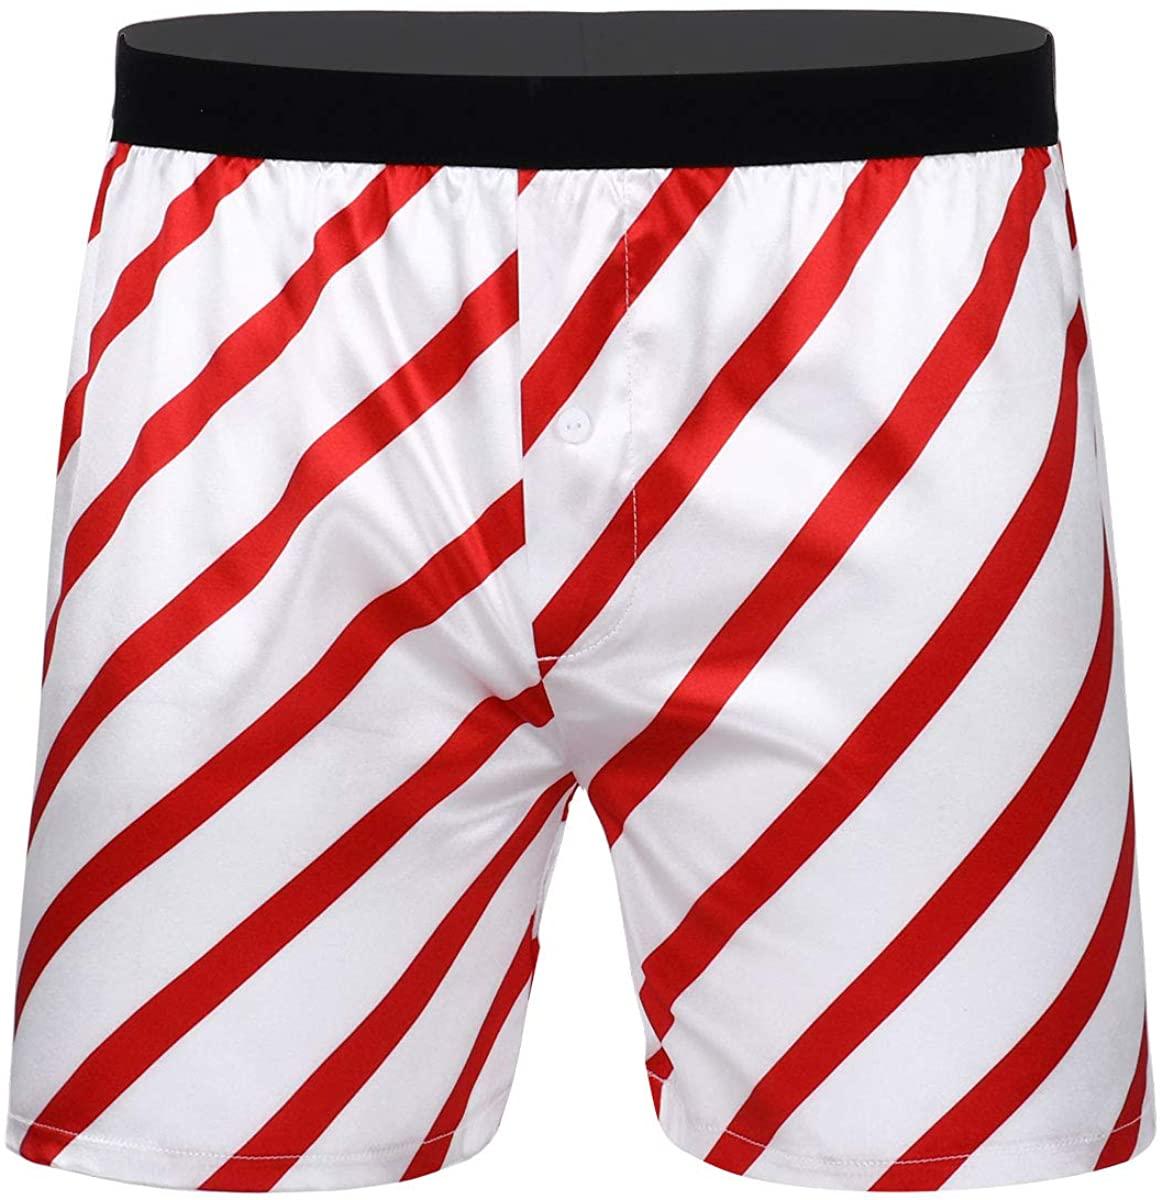 CHICTRY Men's Silk Stripe Satin Shiny Satin Boxer Shorts Lounge Trunks Underwear Christmas Holiday